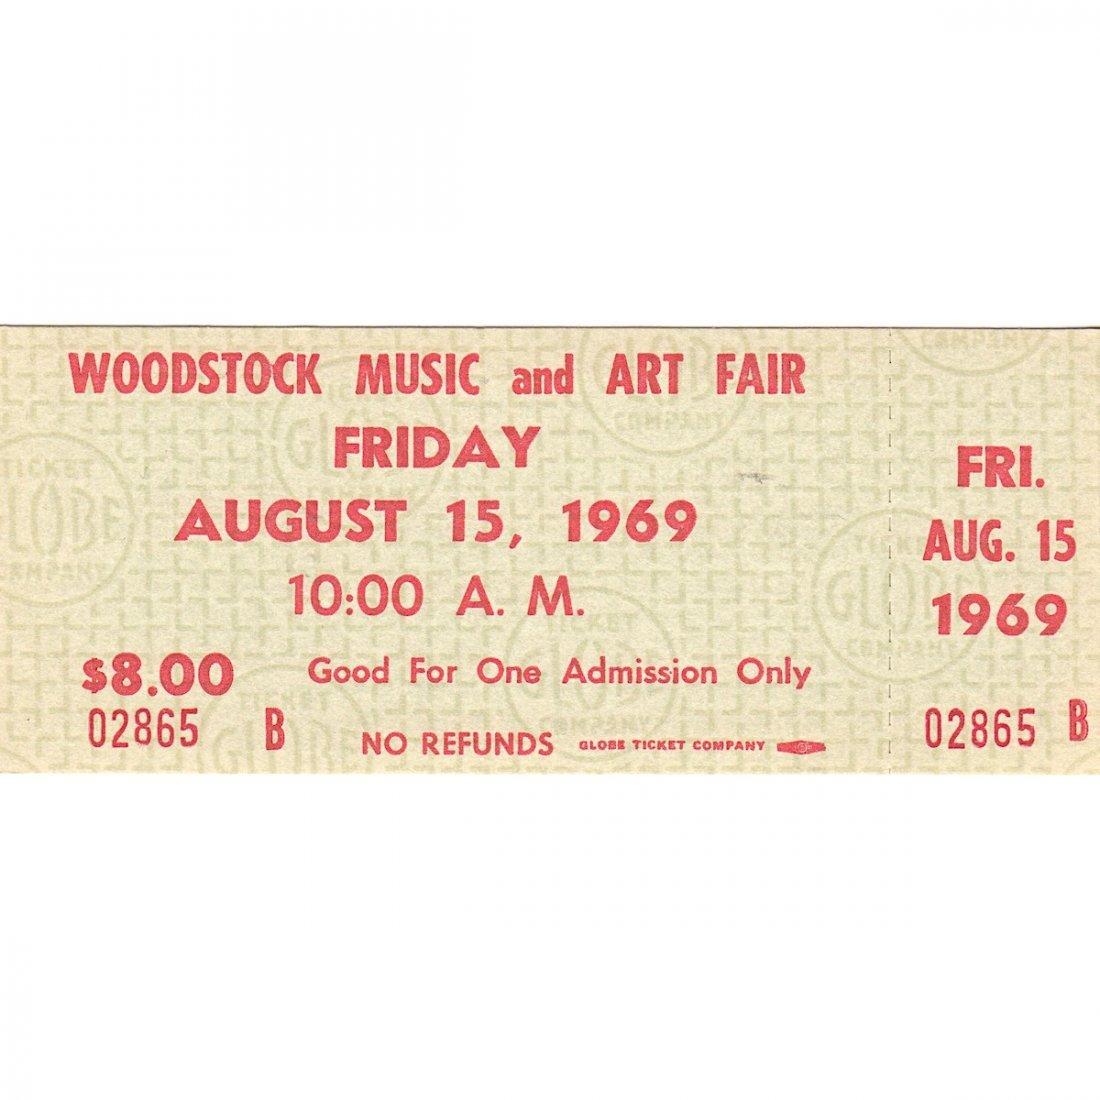 Woodstock - 1969 Friday Vintage Concert Ticket